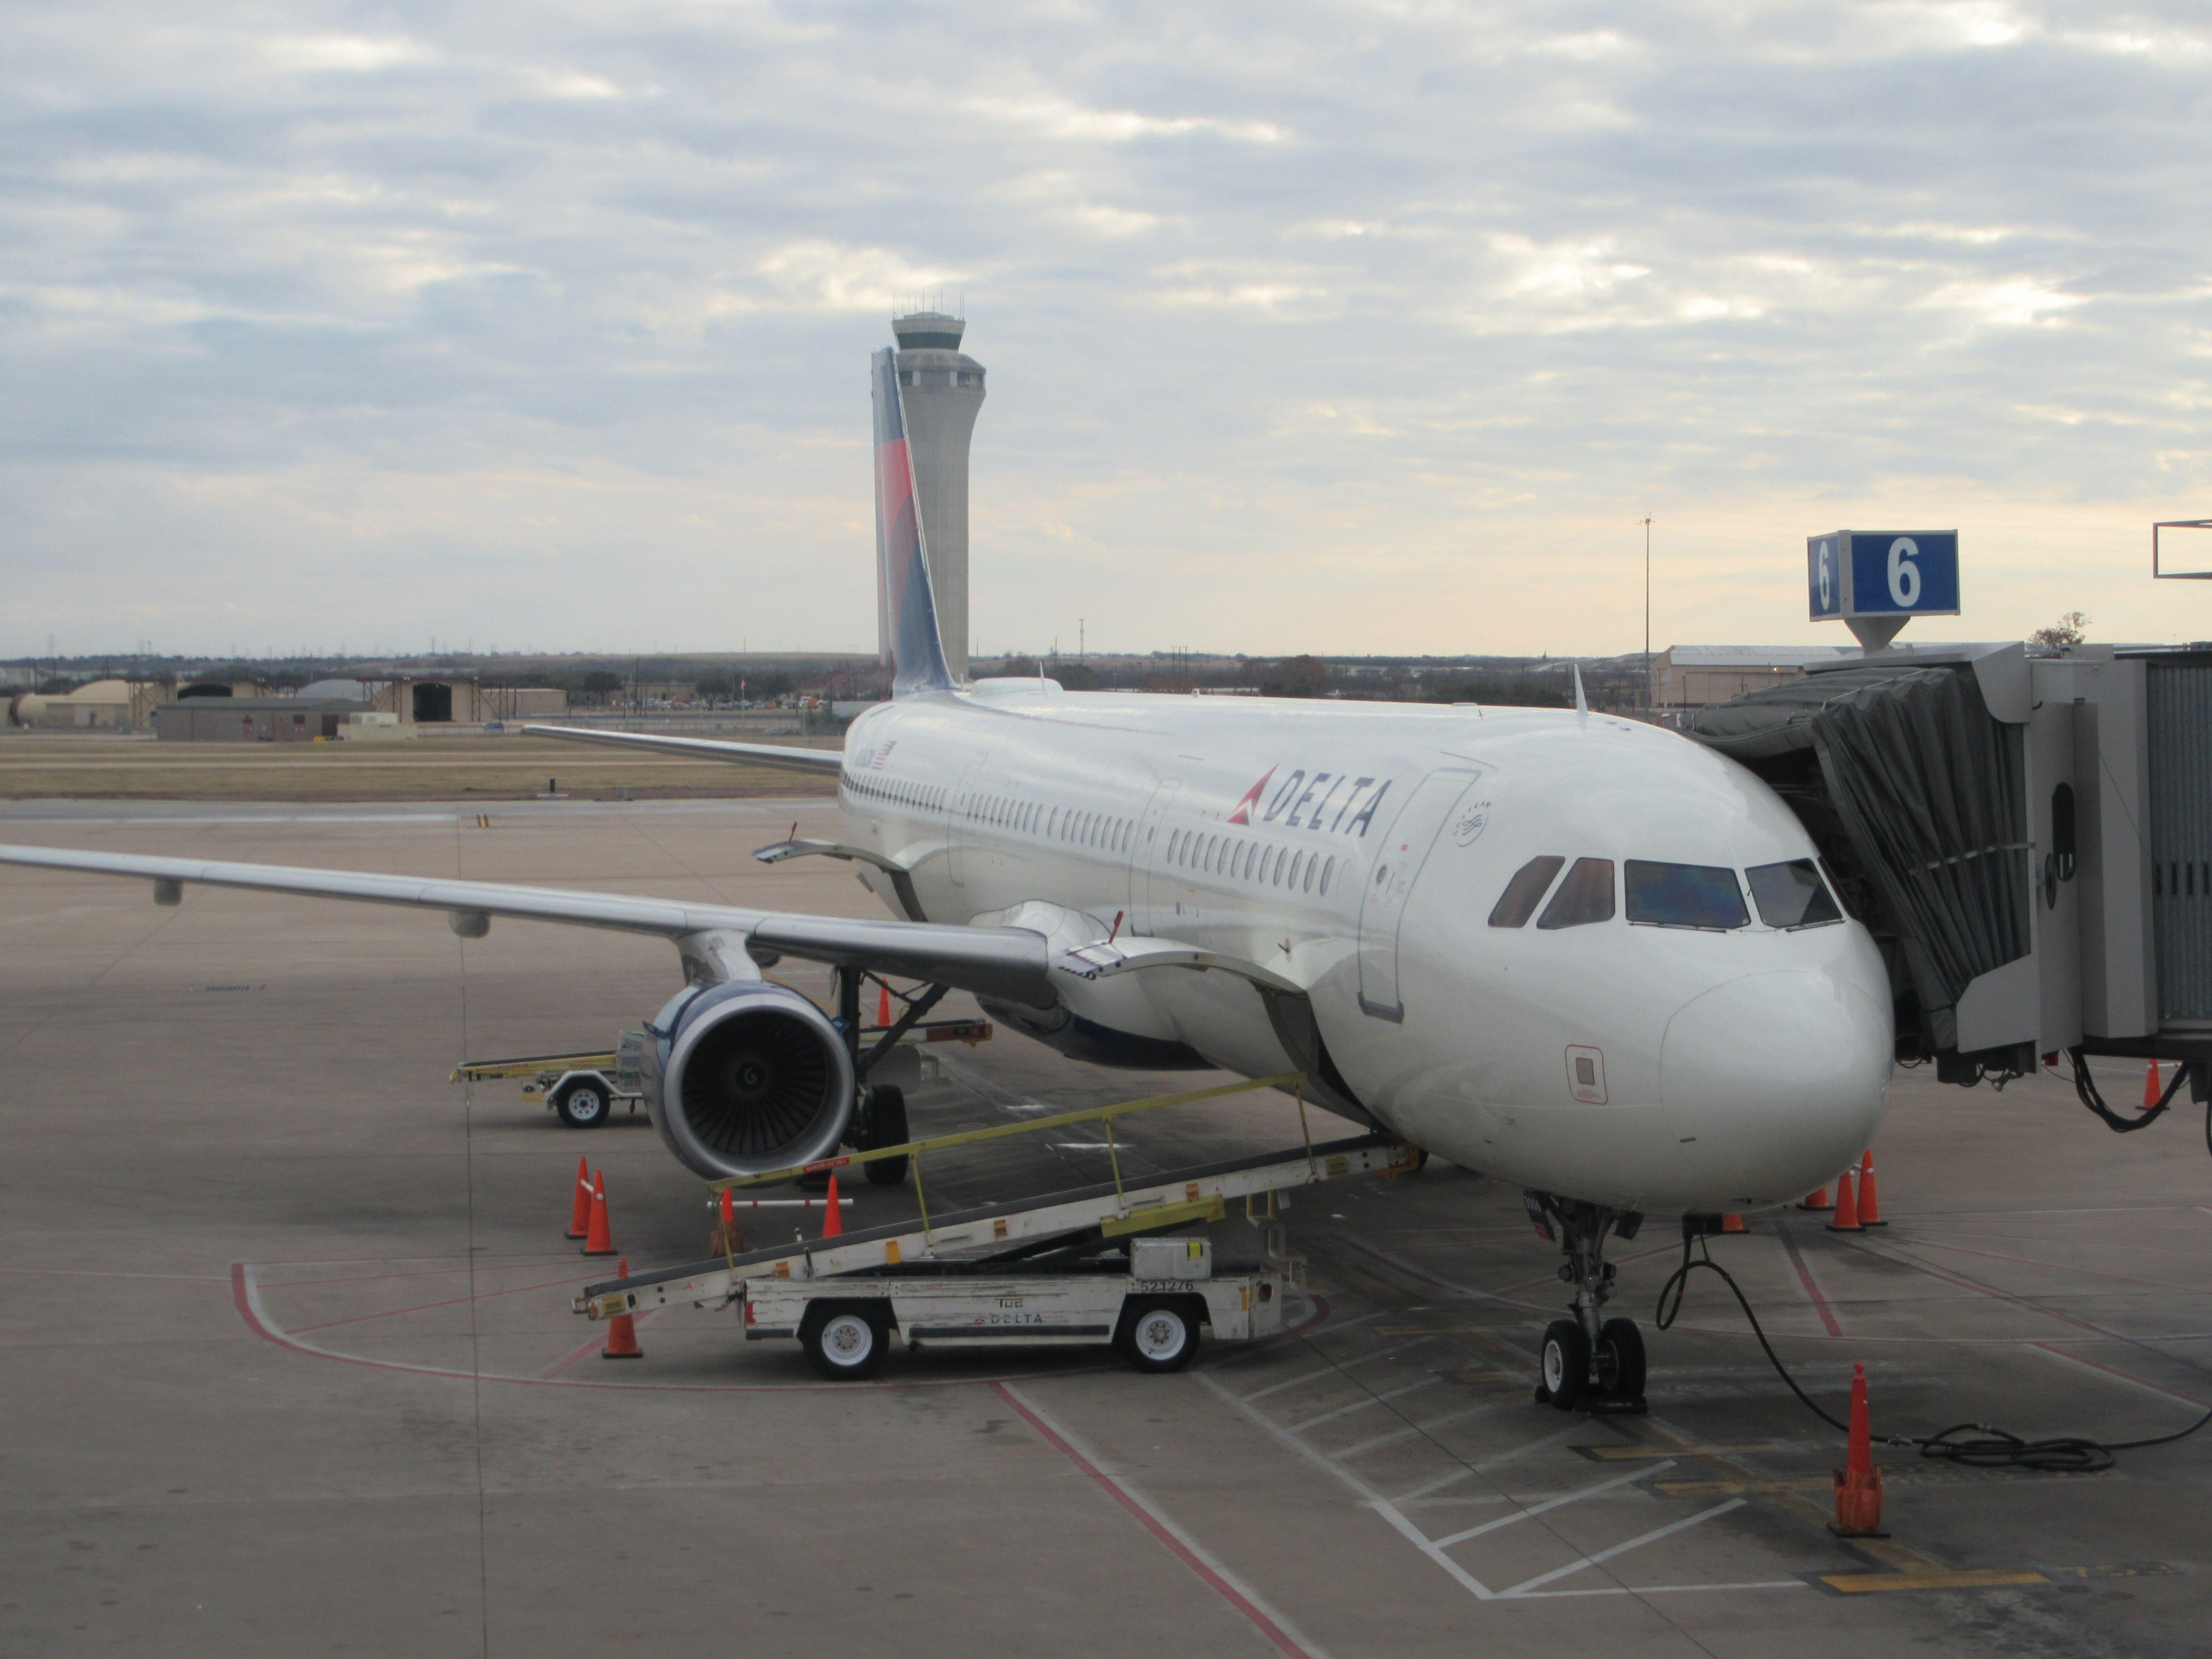 Delta Al A321, Austin Jan 2018 Aircraft photos, Aircraft